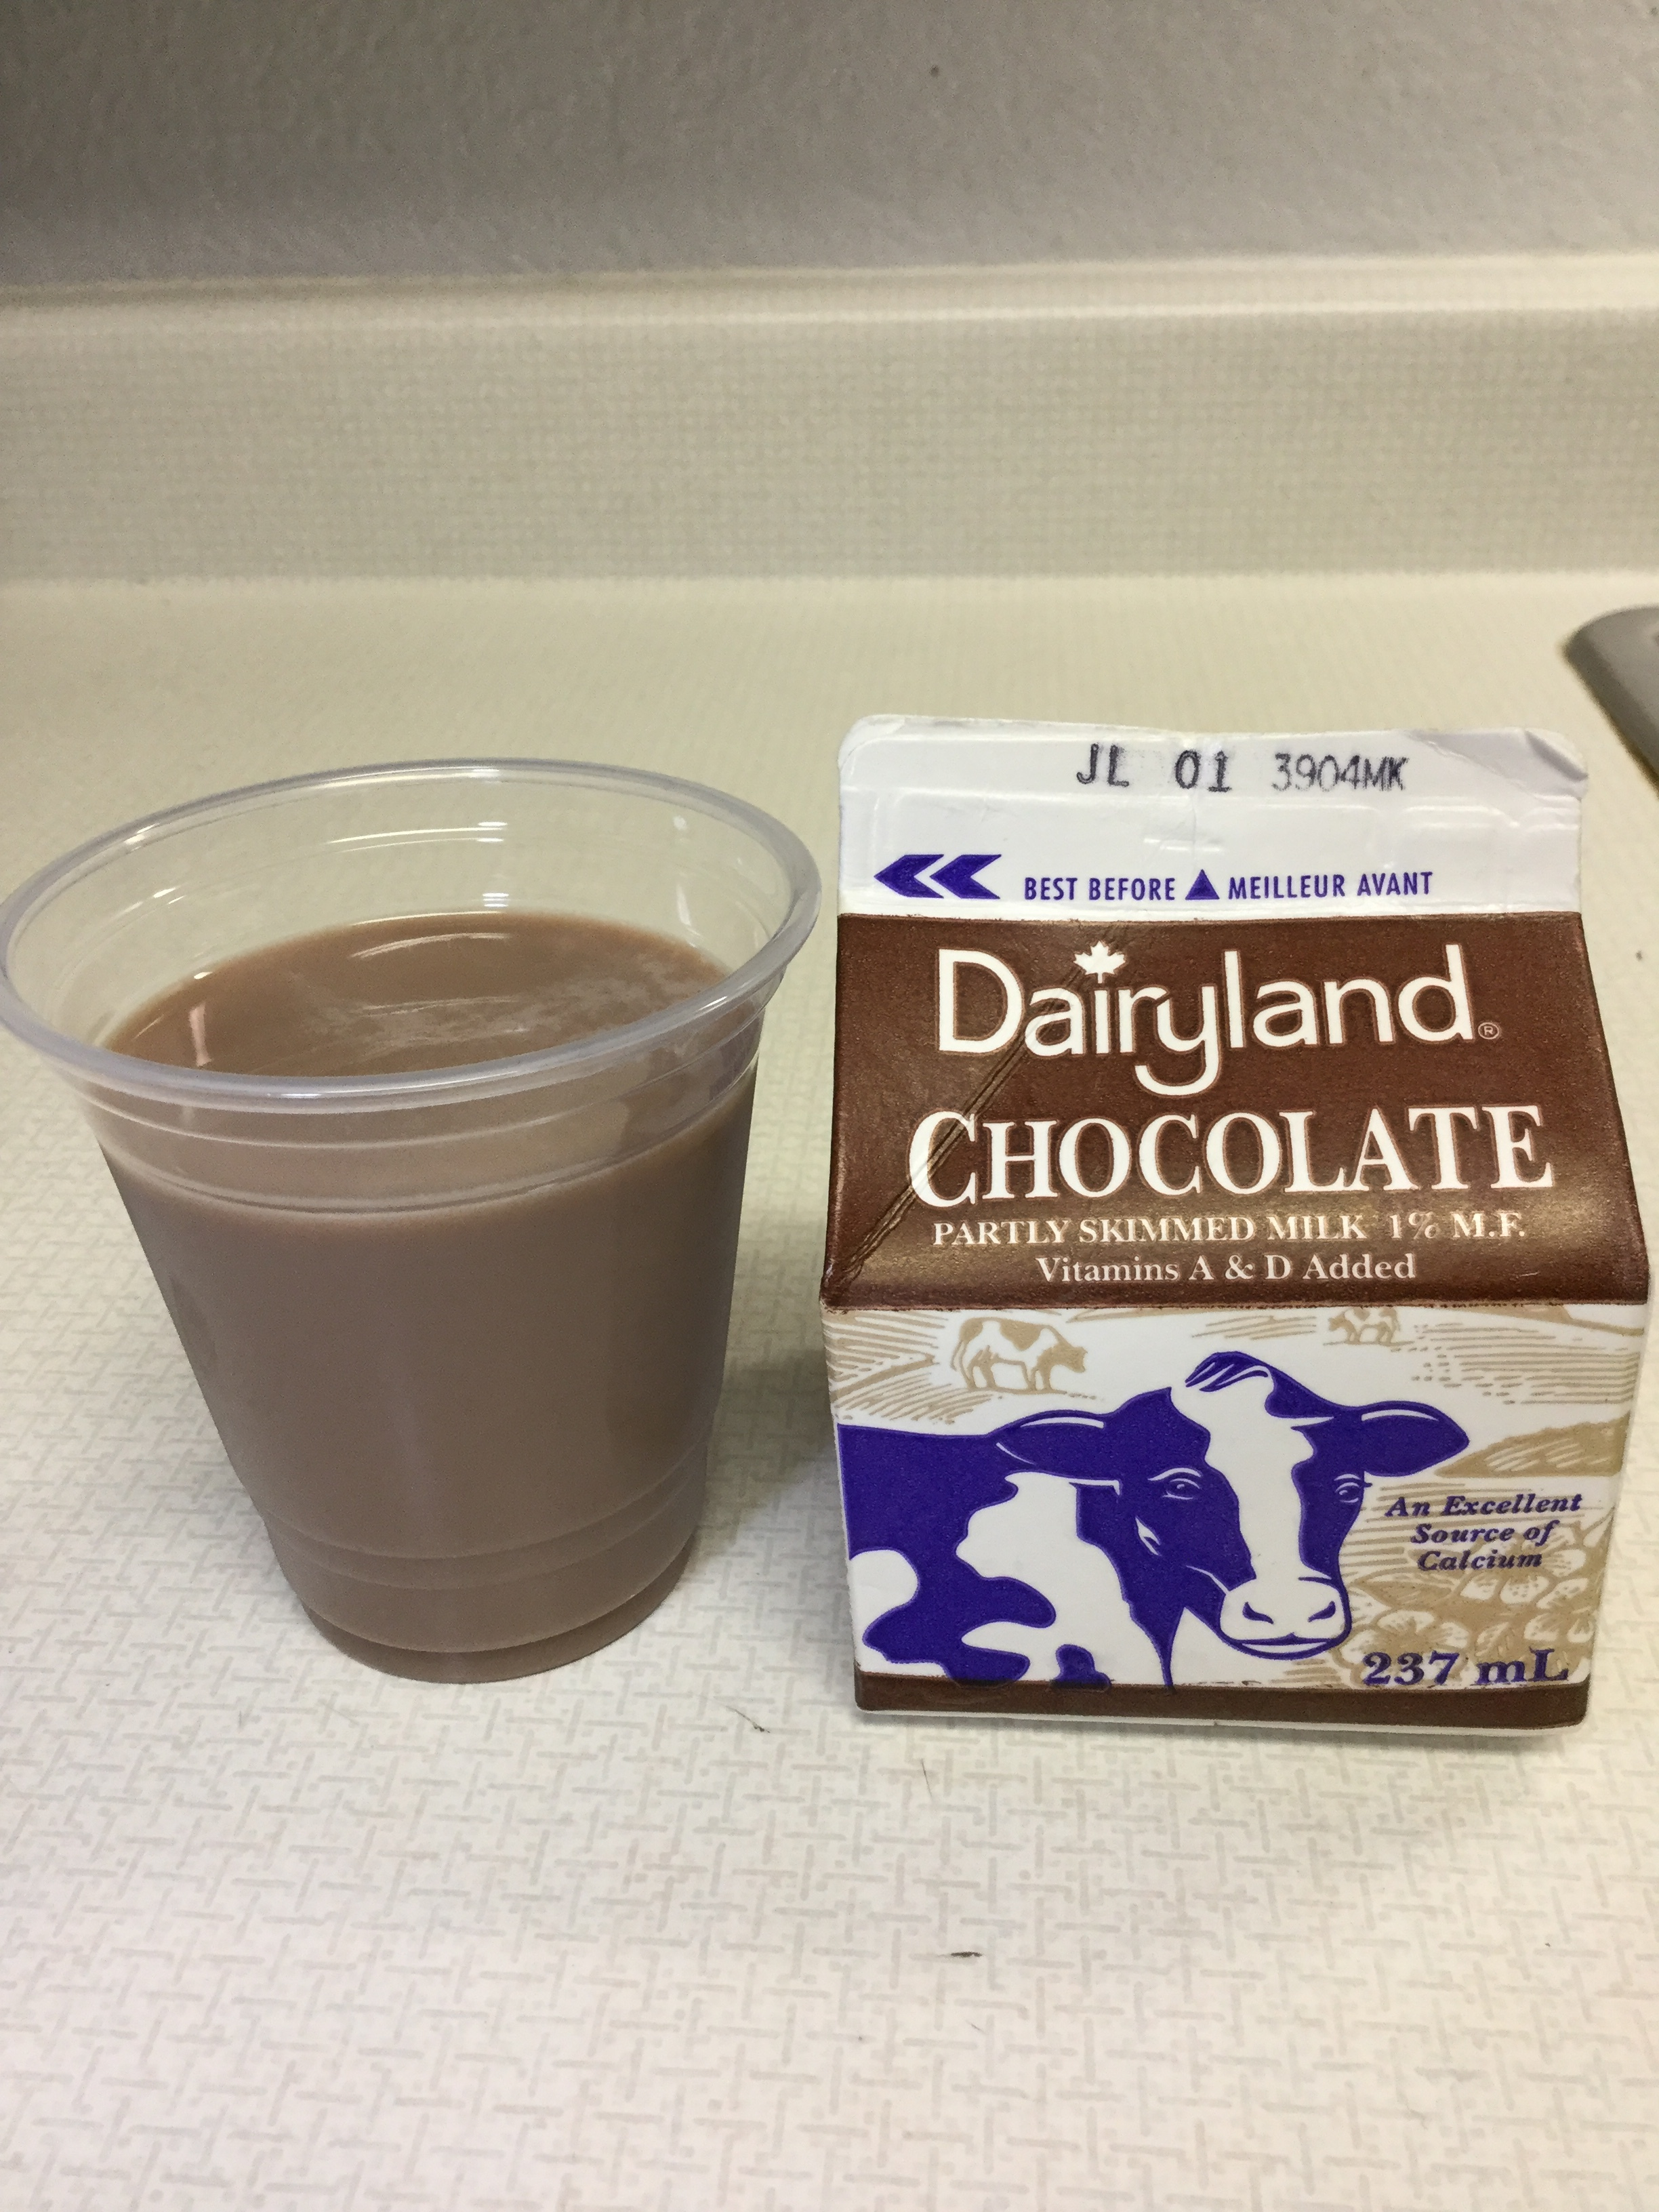 Dairyland Chocolate Partly Skimmed Milk Cup